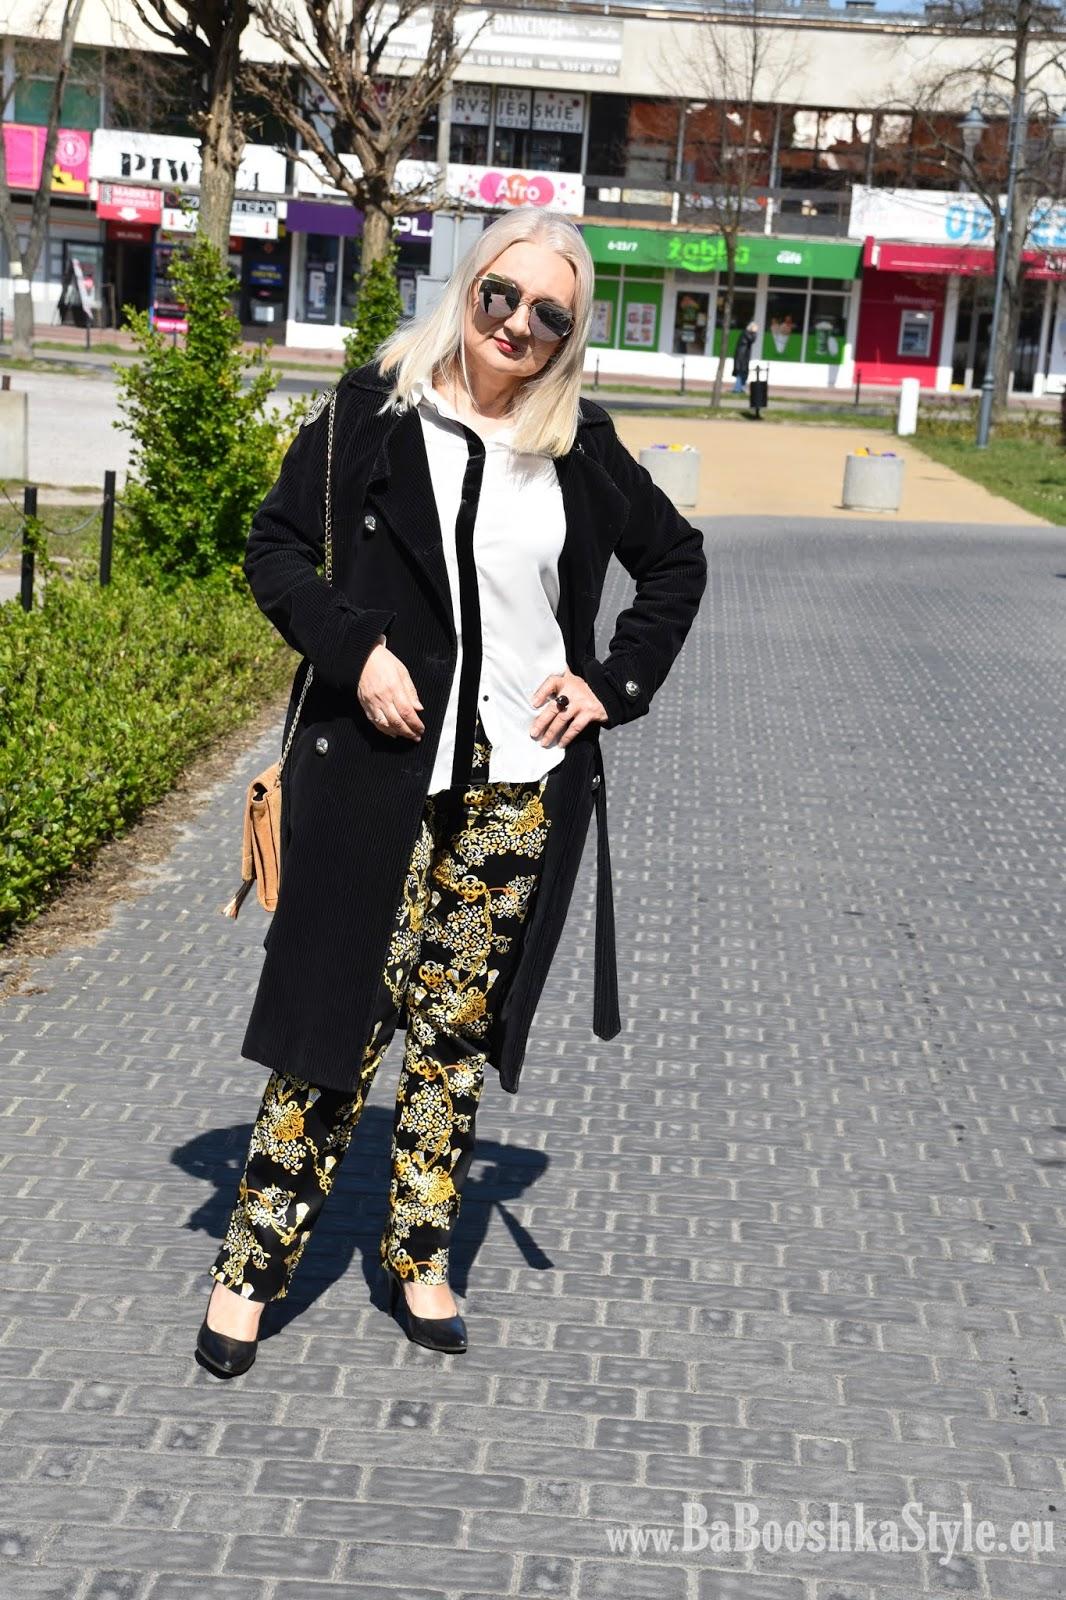 Babooshkastyle, stylistkaBabooshka, personal shopper, osobista stylistka, vintage, glamour, over50fashion,